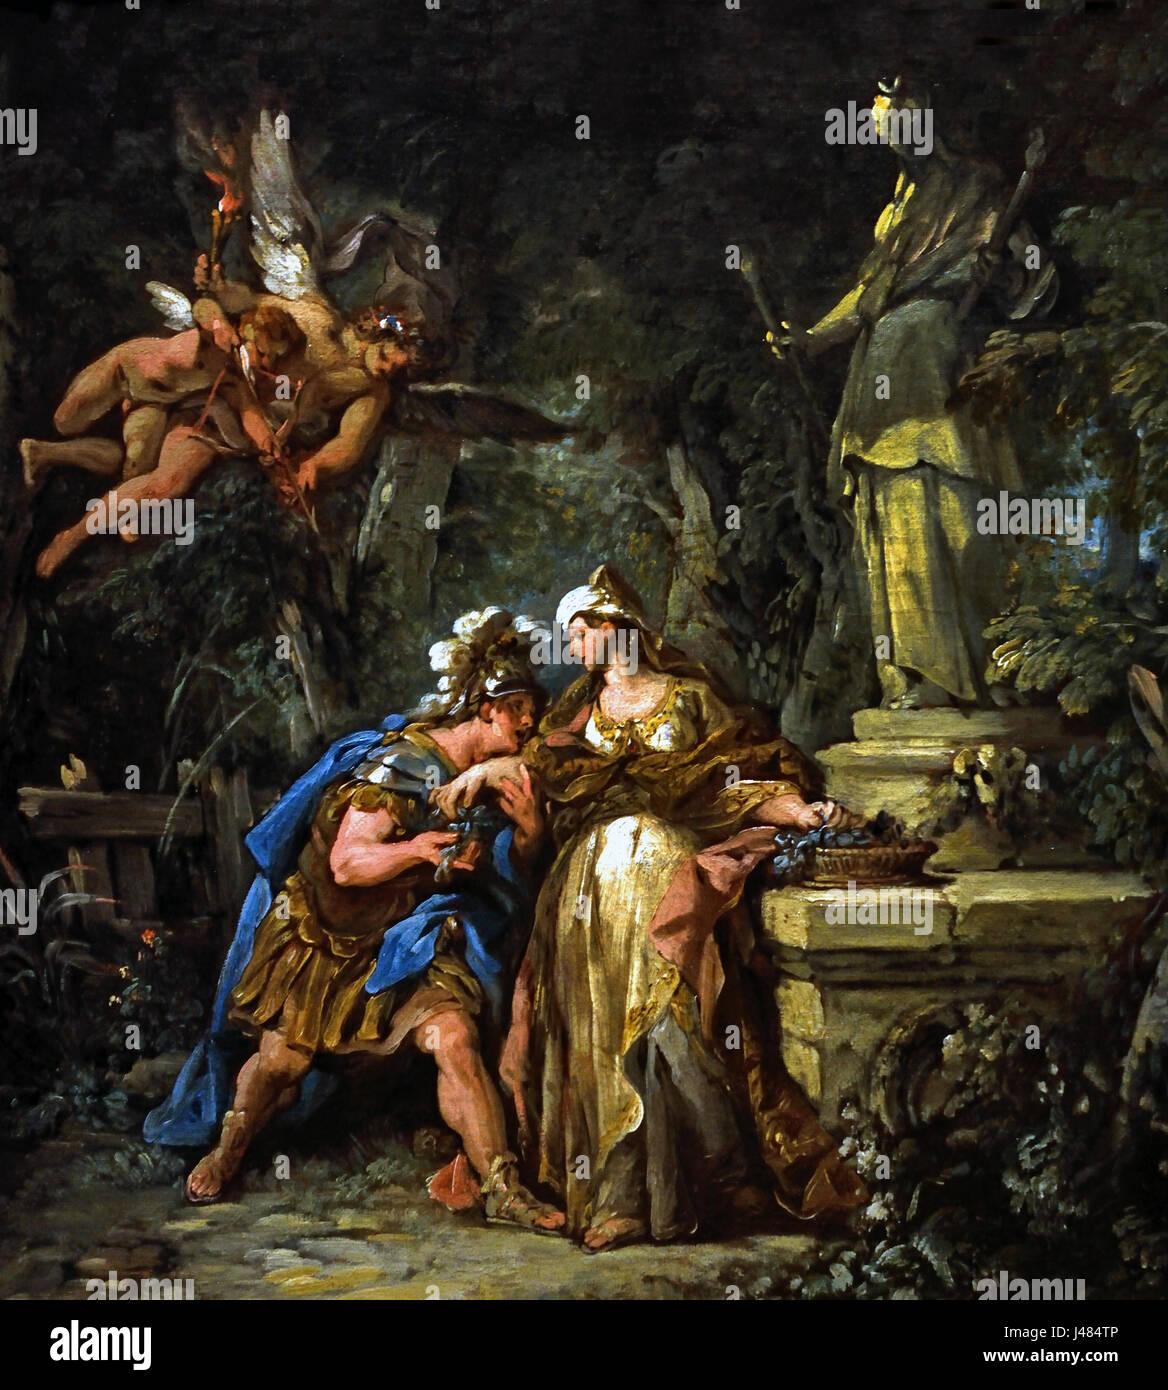 Jason swearing Eternal Affection to Medea 1742-3, Jean-François Detroy 1679 - 1752  French ,France(  Ovid's - Stock Image